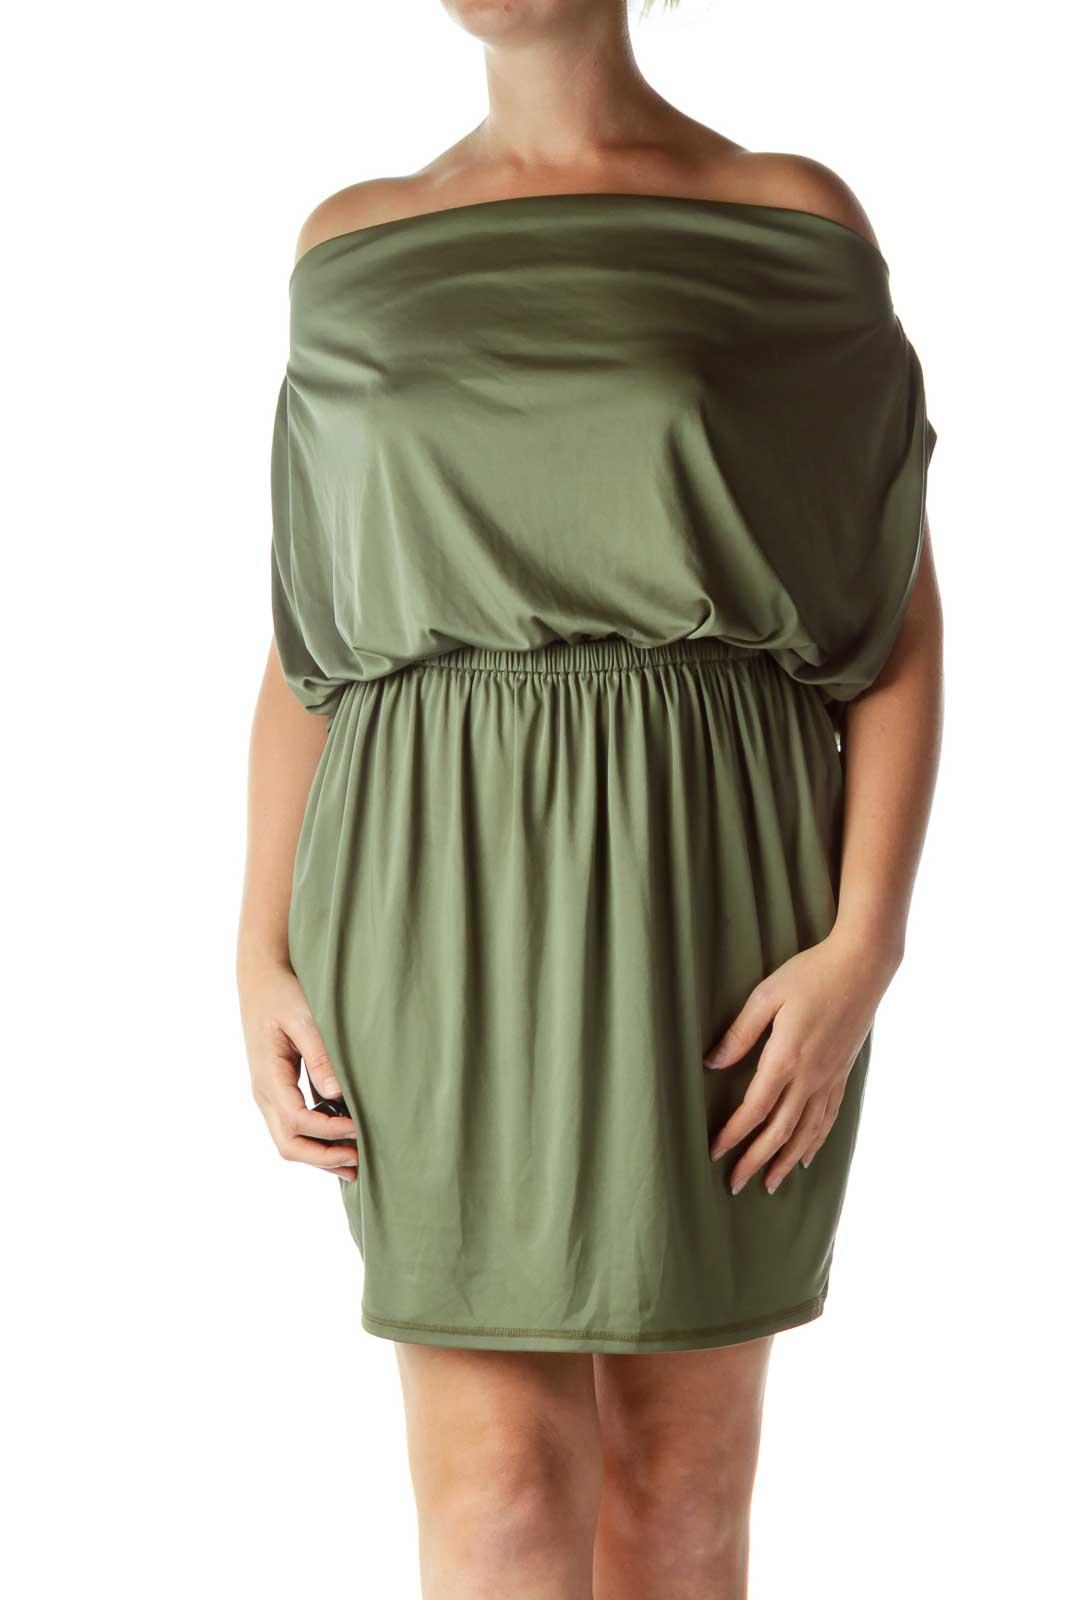 Green Satin Cowl Neck Cocktail Dress